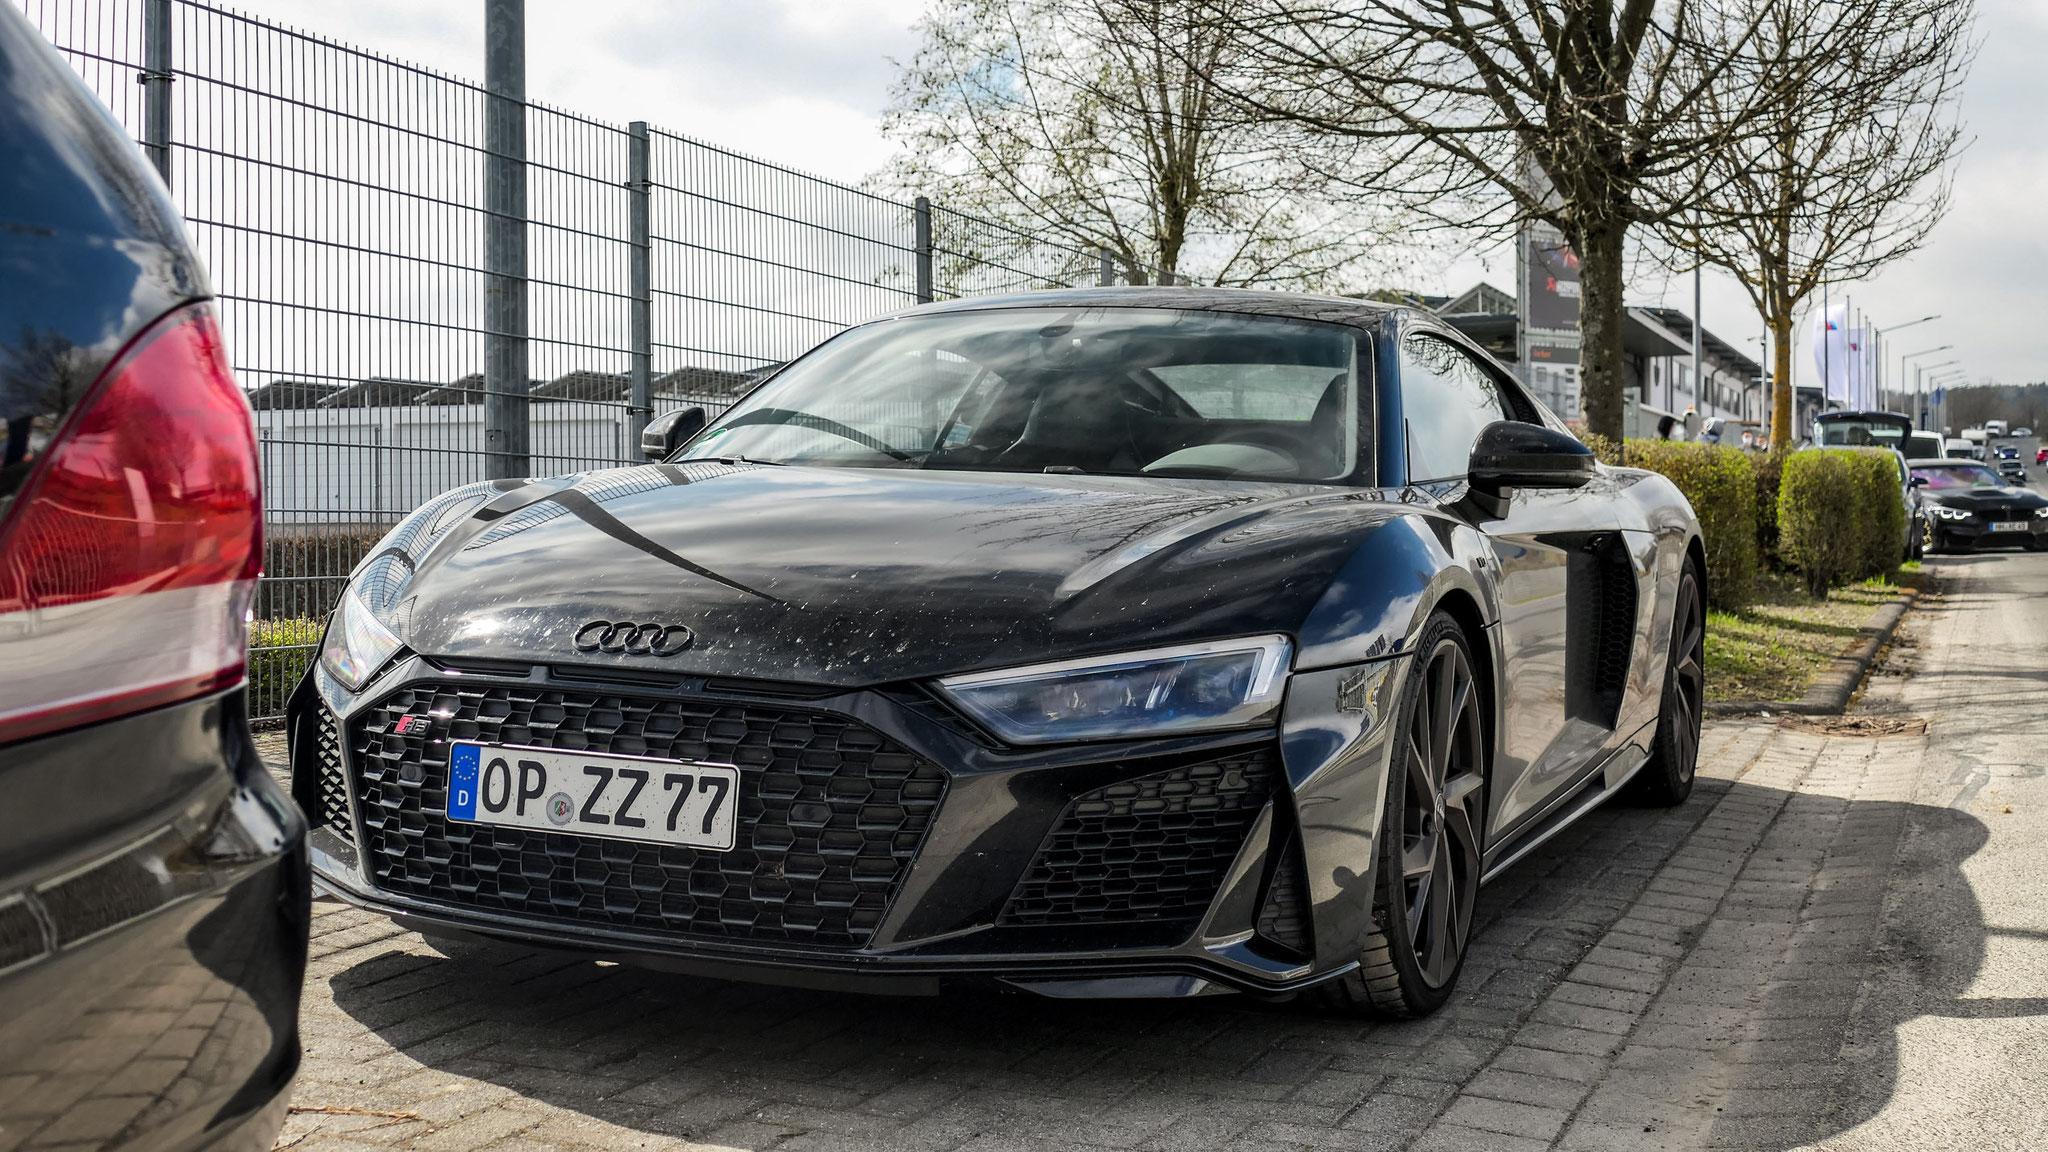 Audi R8 V10 - OP-ZZ-77